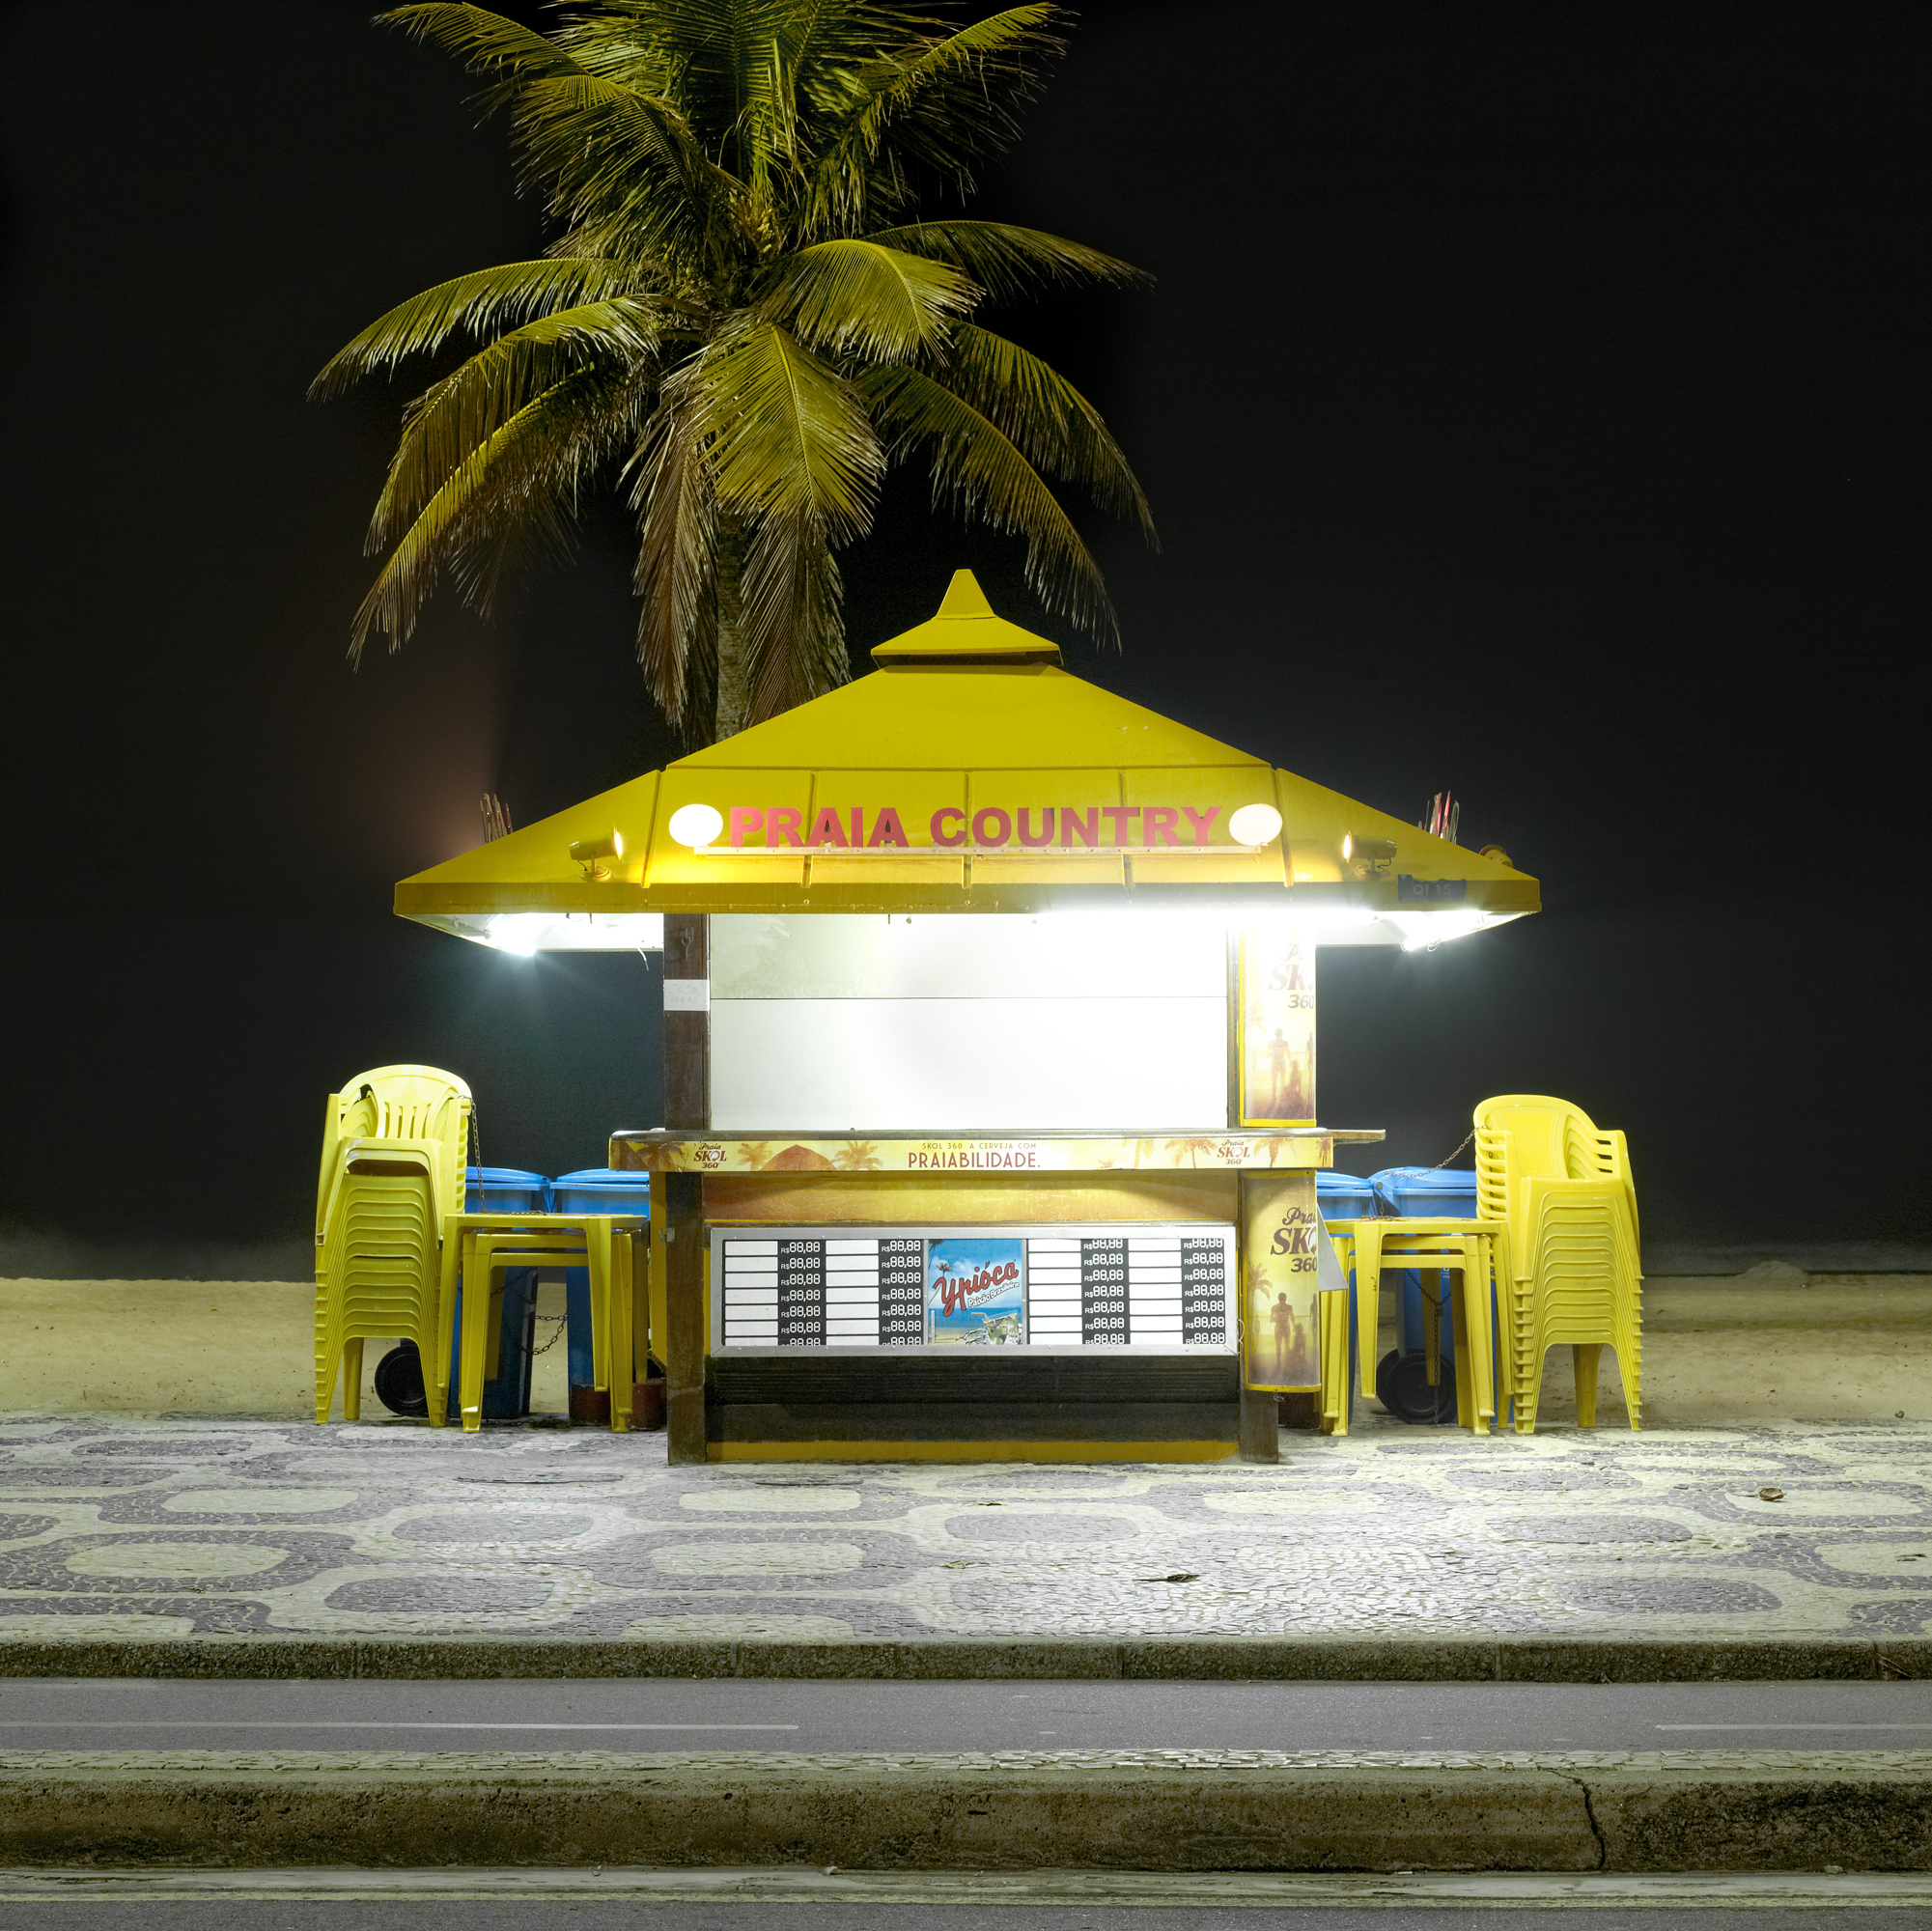 PraiaCountry.jpg